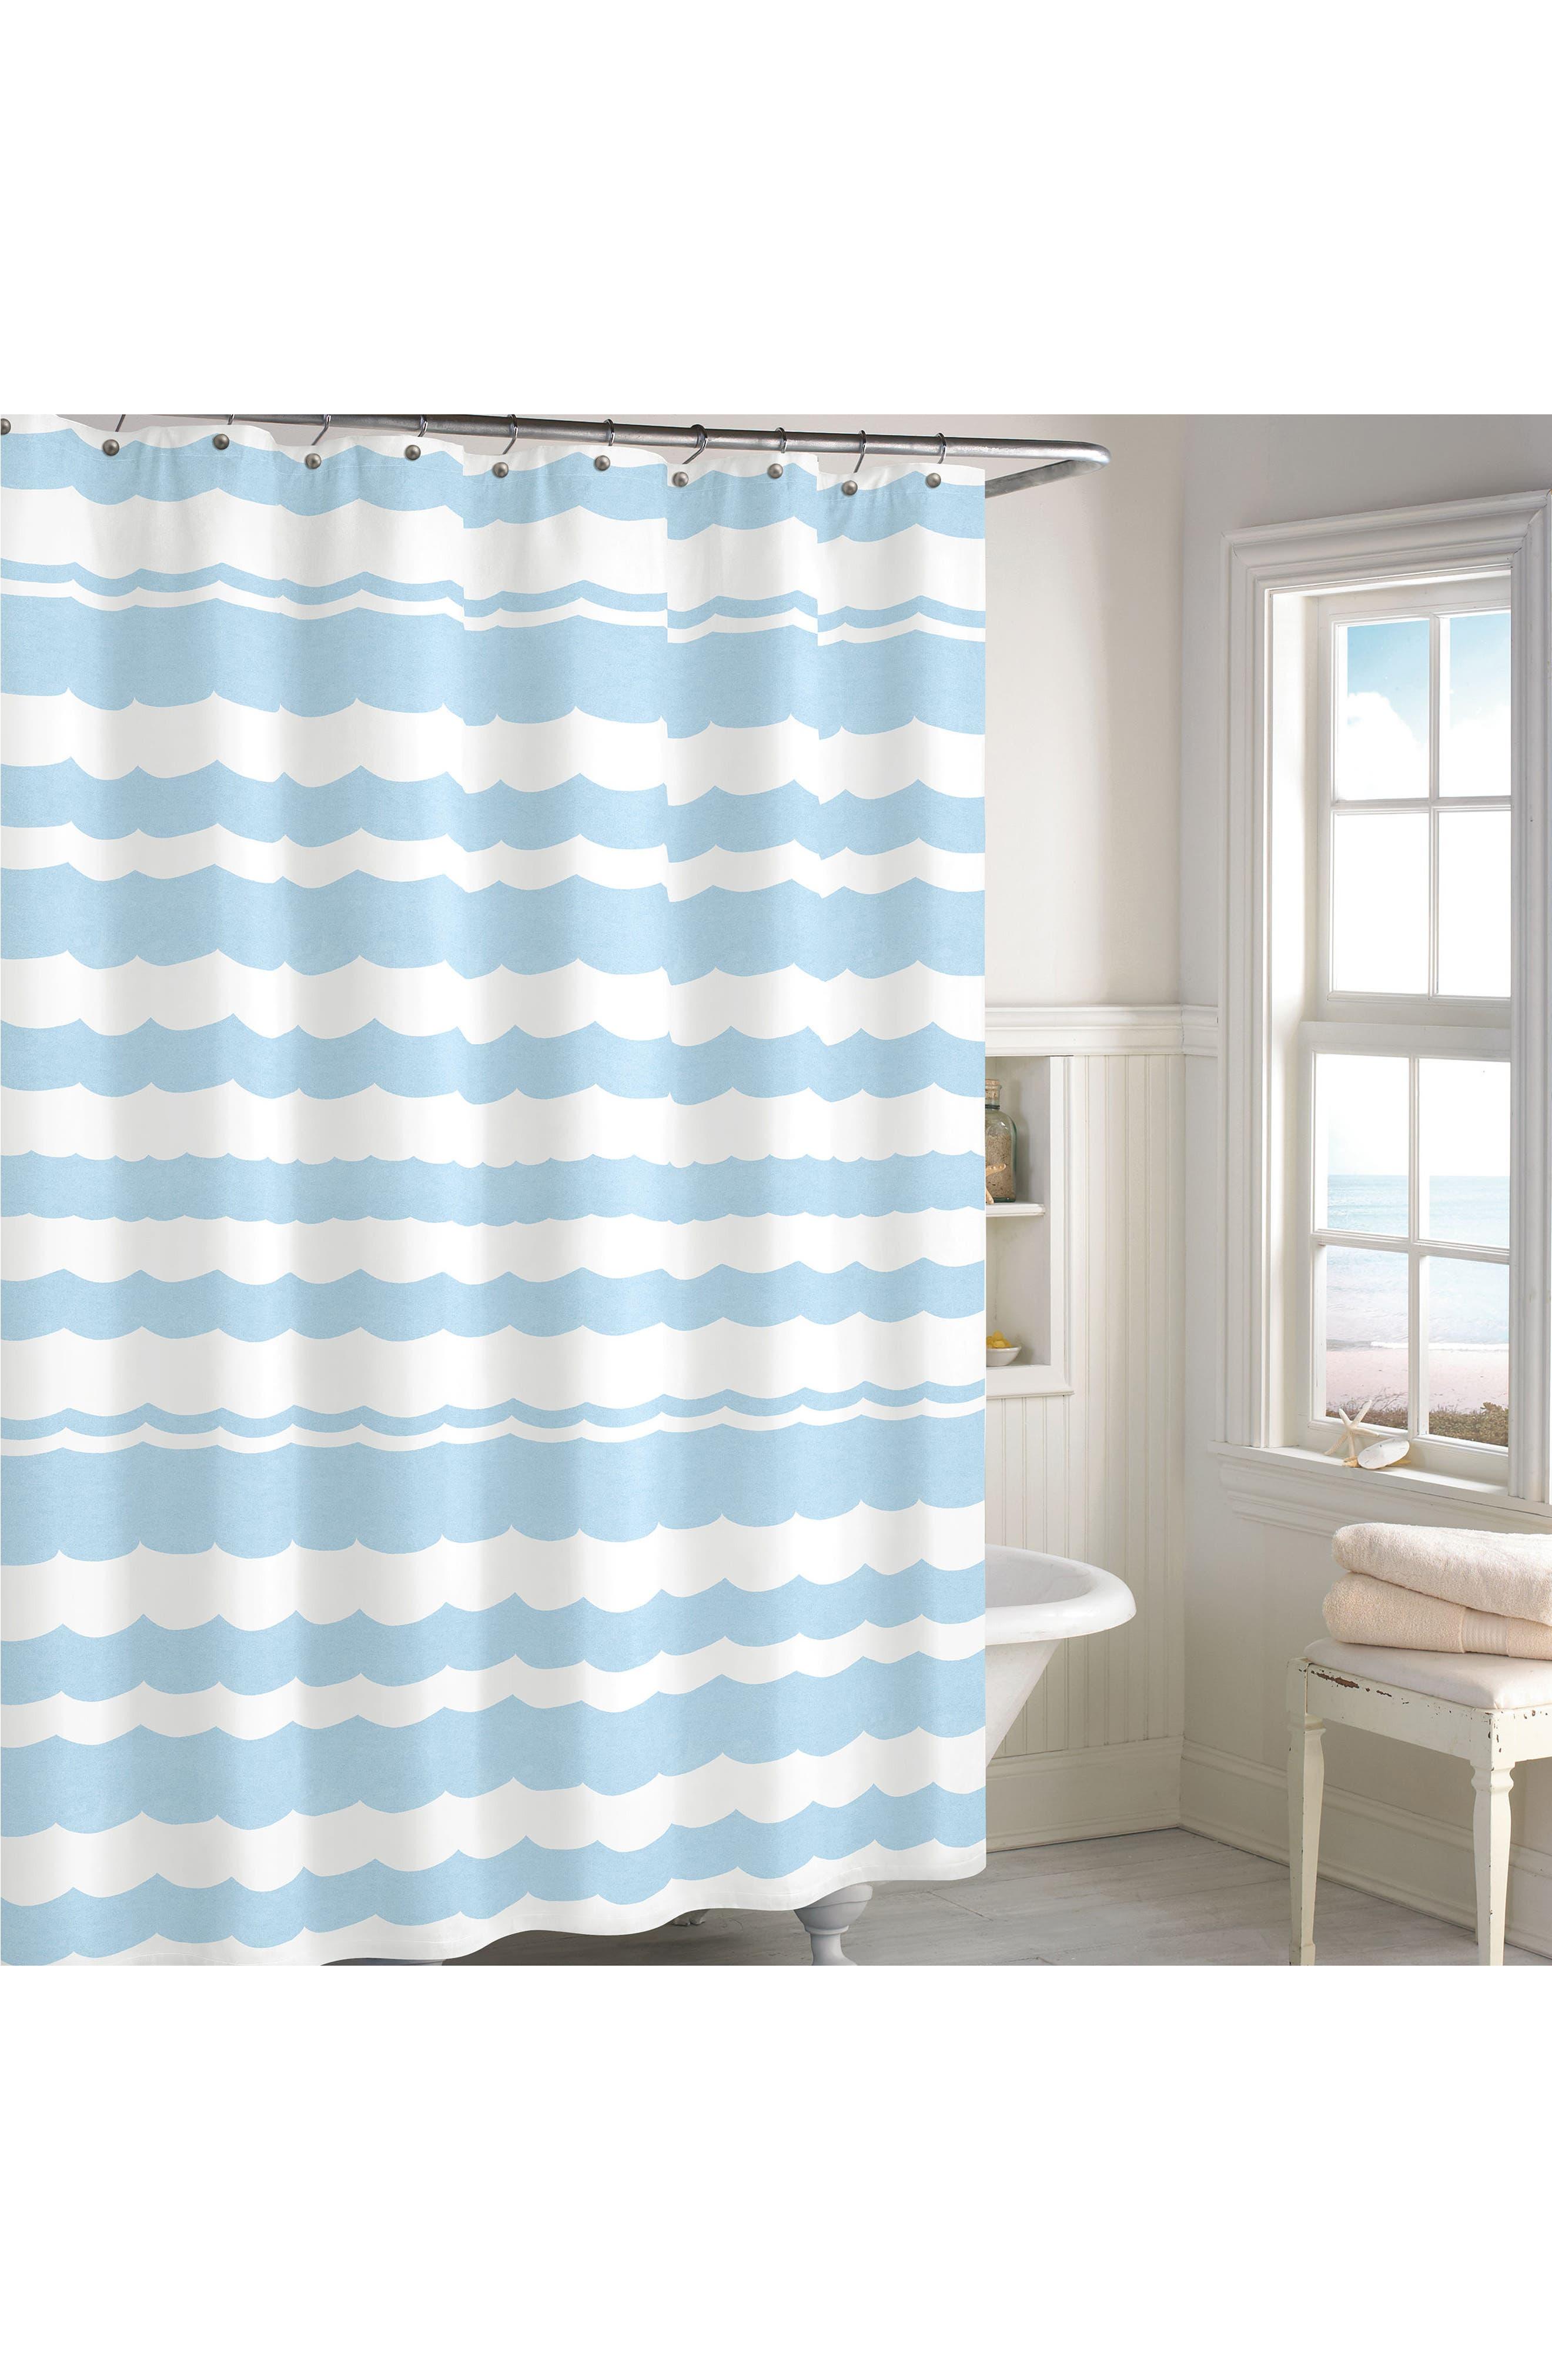 Wave Scallop Shower Curtain,                             Main thumbnail 1, color,                             Blue